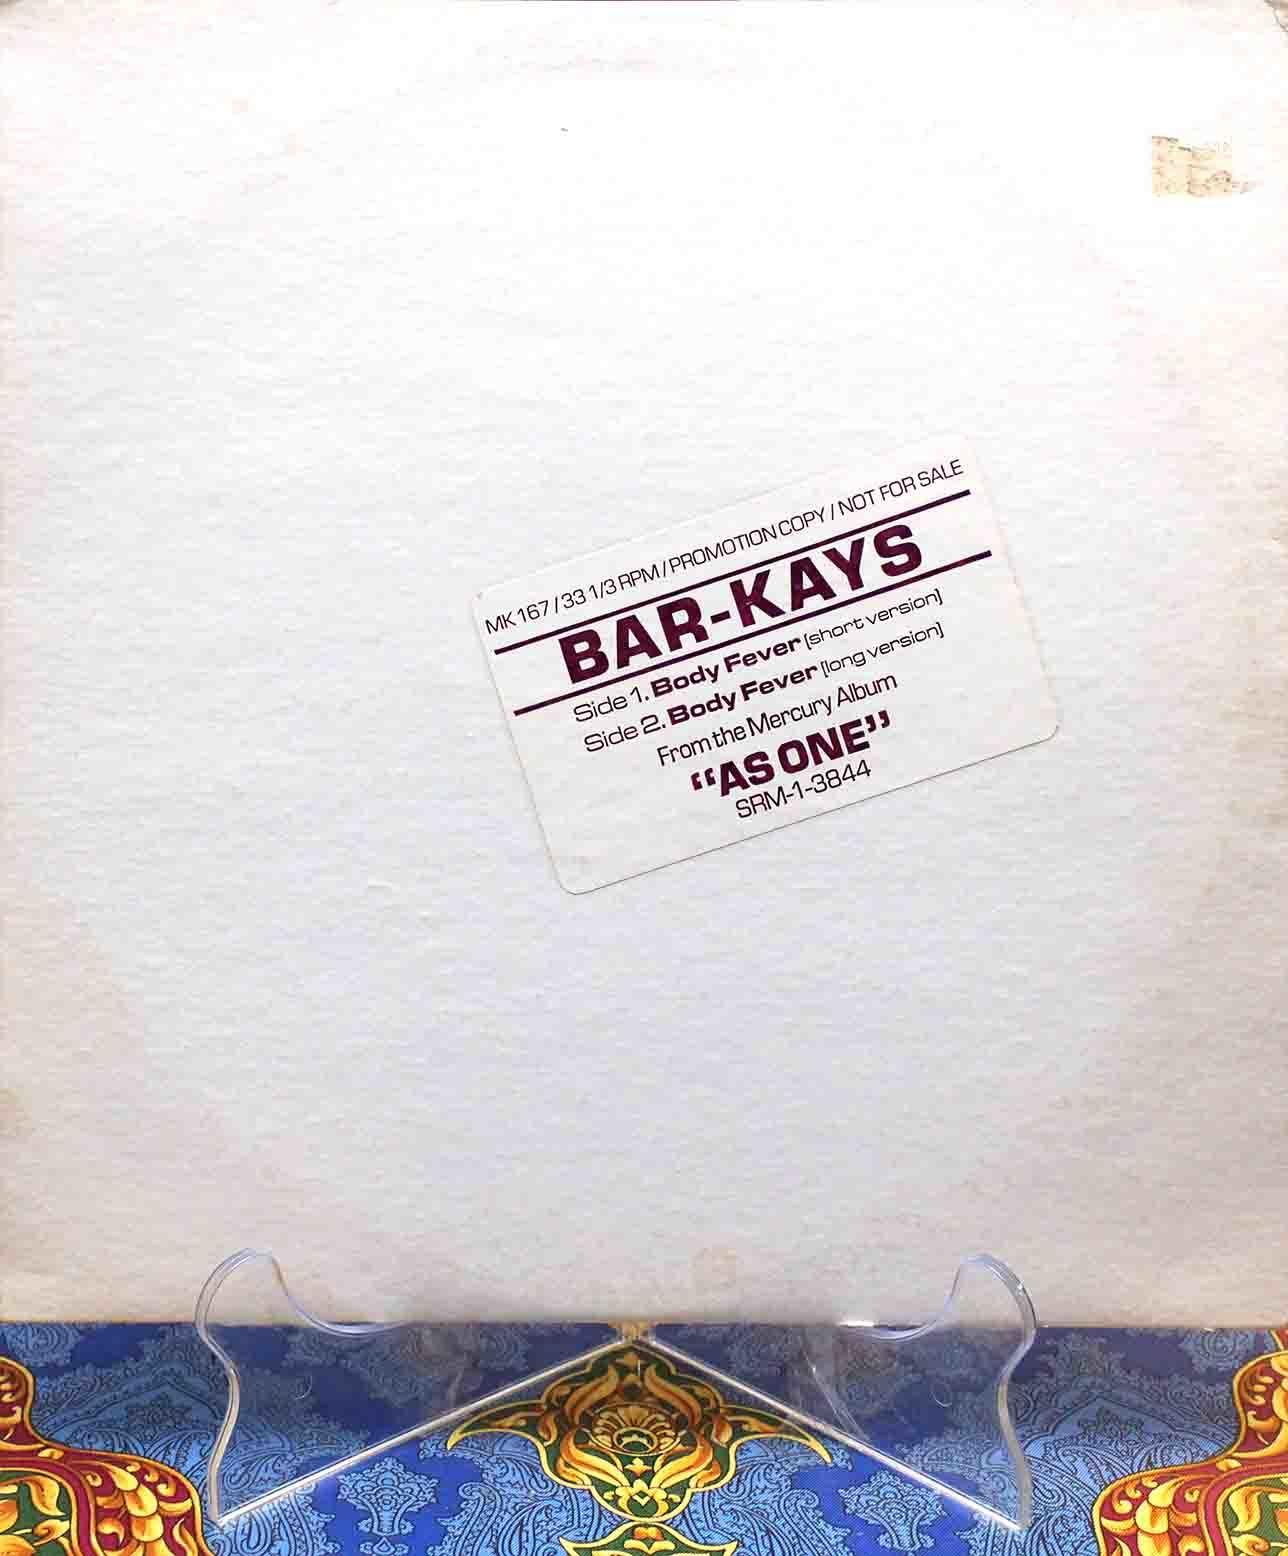 Bar-Kays – Body Fever 01